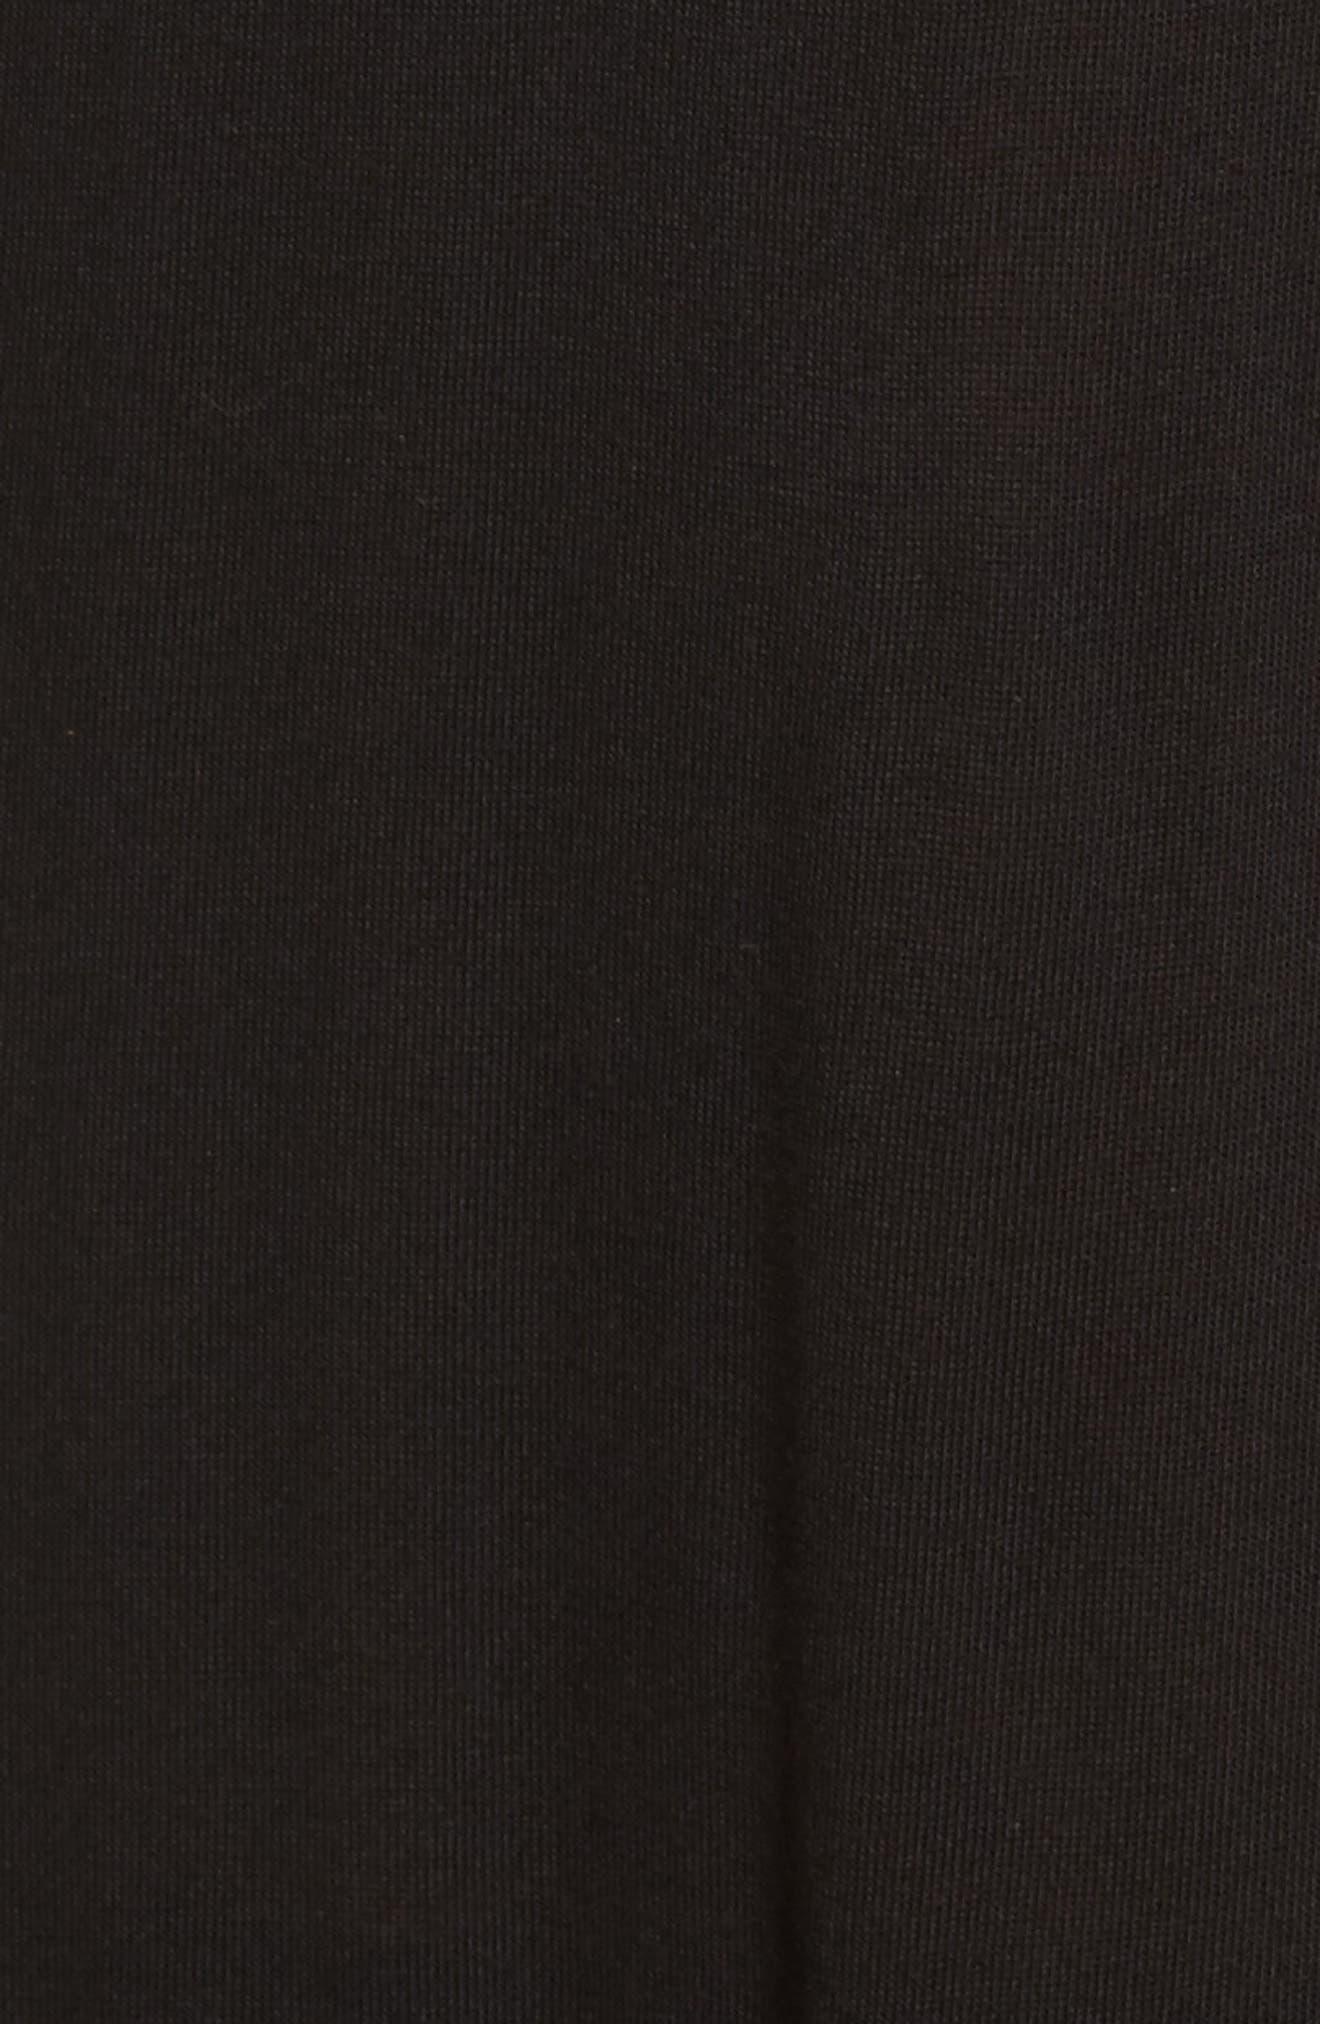 Ruffle Cover-Up Dress,                             Alternate thumbnail 5, color,                             Black